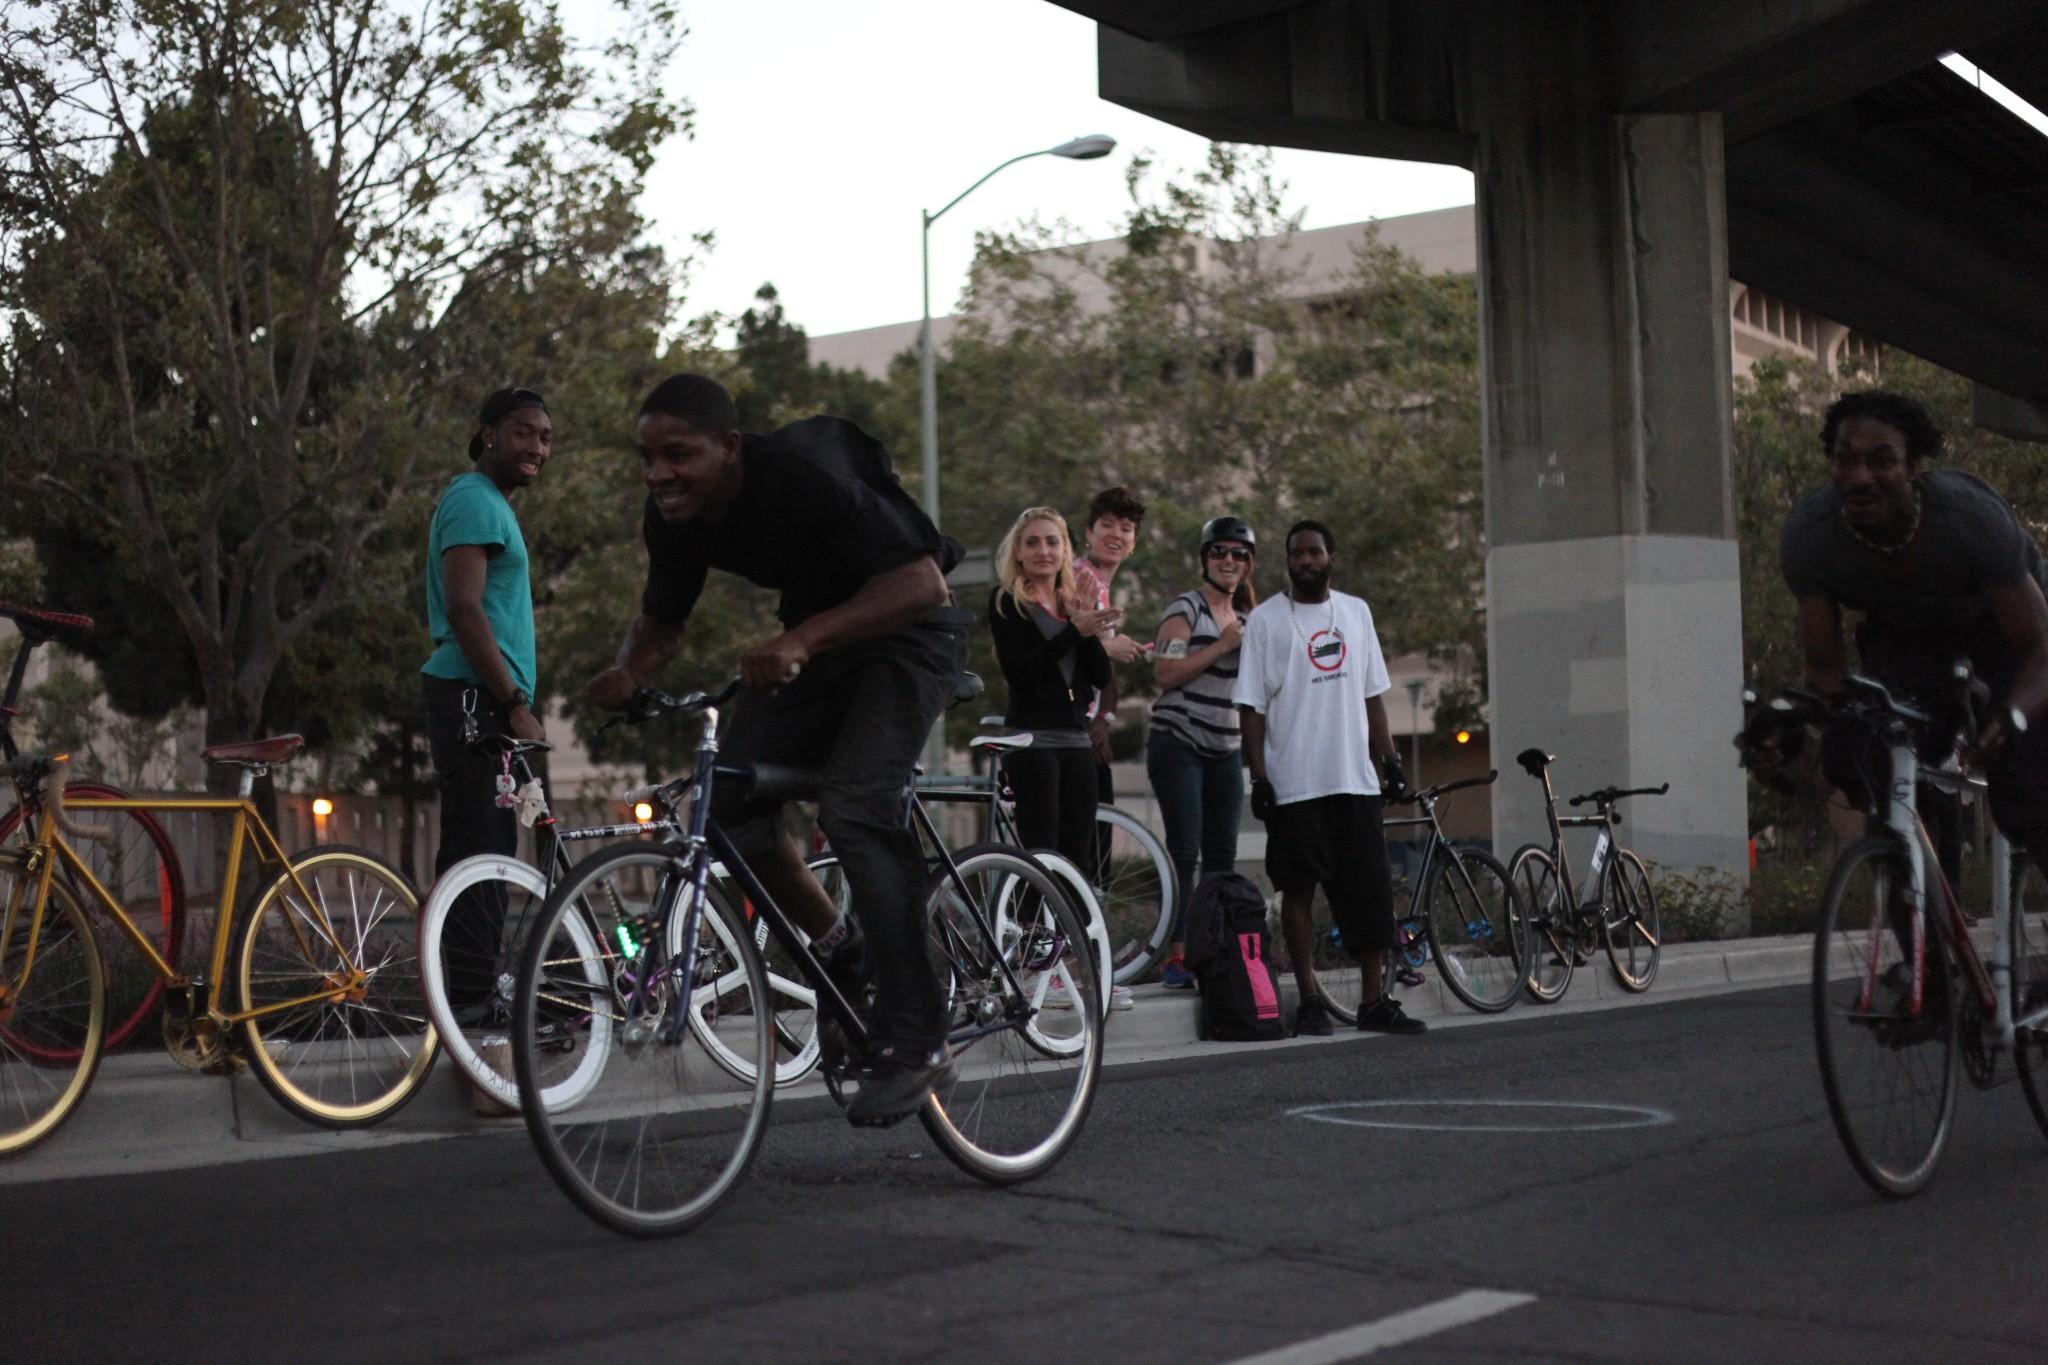 Photo: Bike racers racing towards the finish line